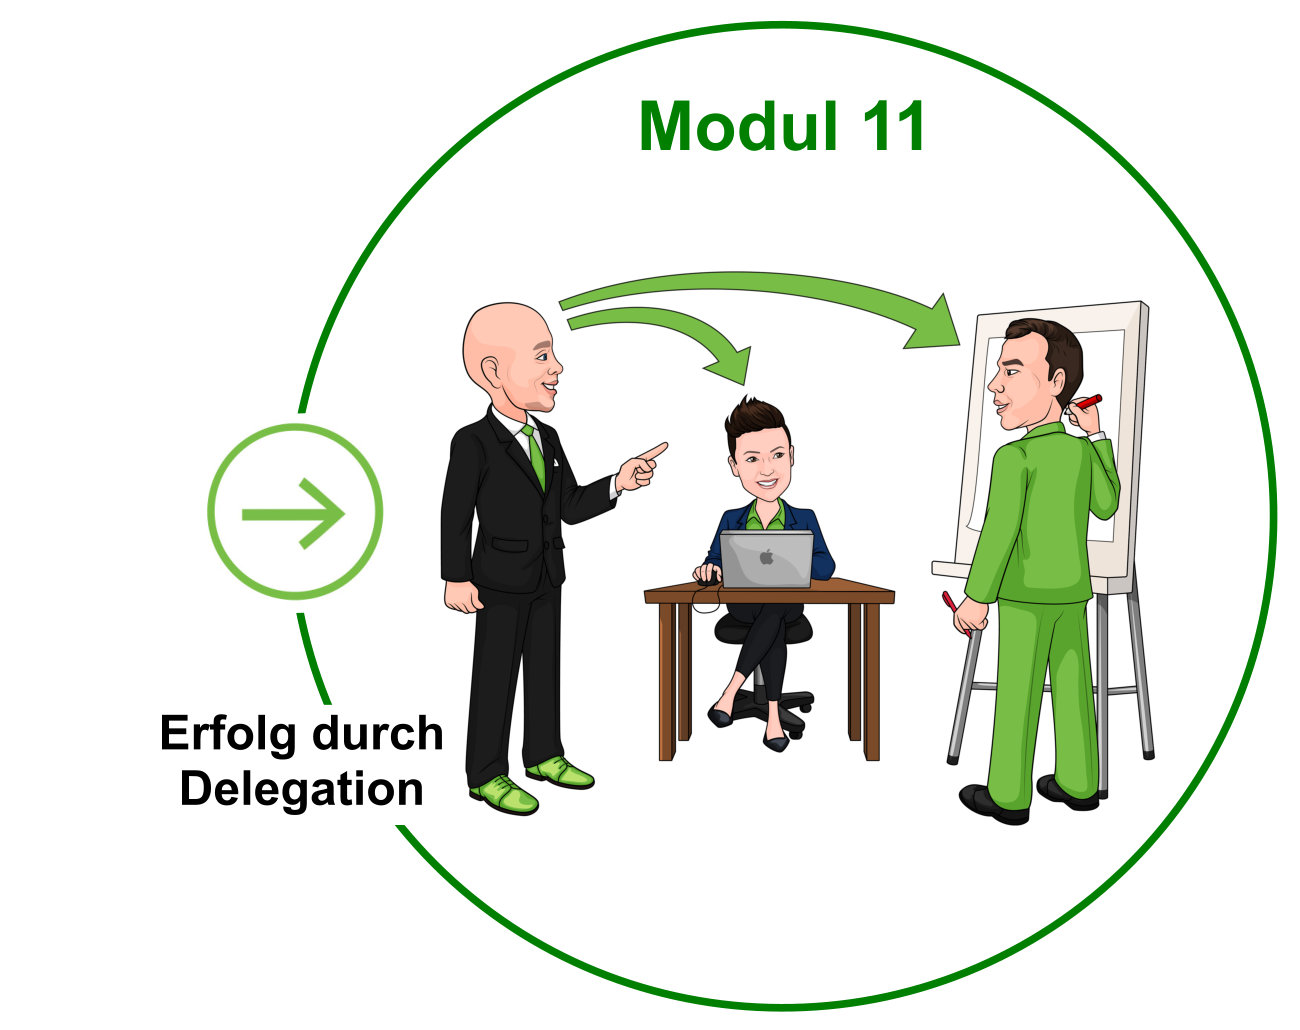 Modul 11 - Erfolg durch Delegation